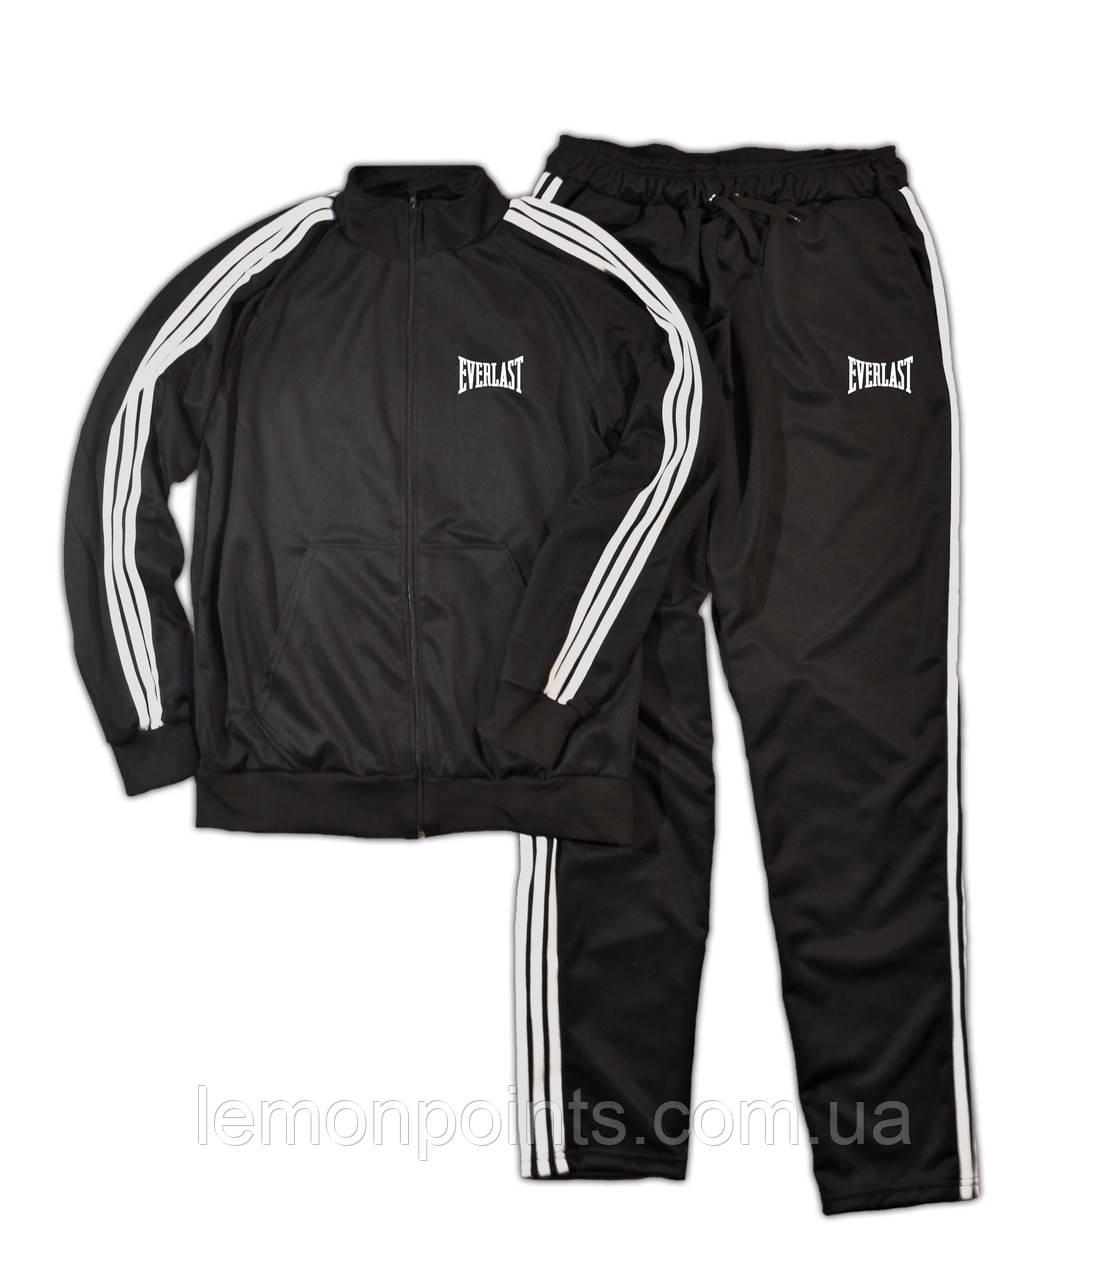 986c48fc Мужской спортивный костюм, чоловічий костюм (эластика с лампасами) Everlast  S436, Реплика